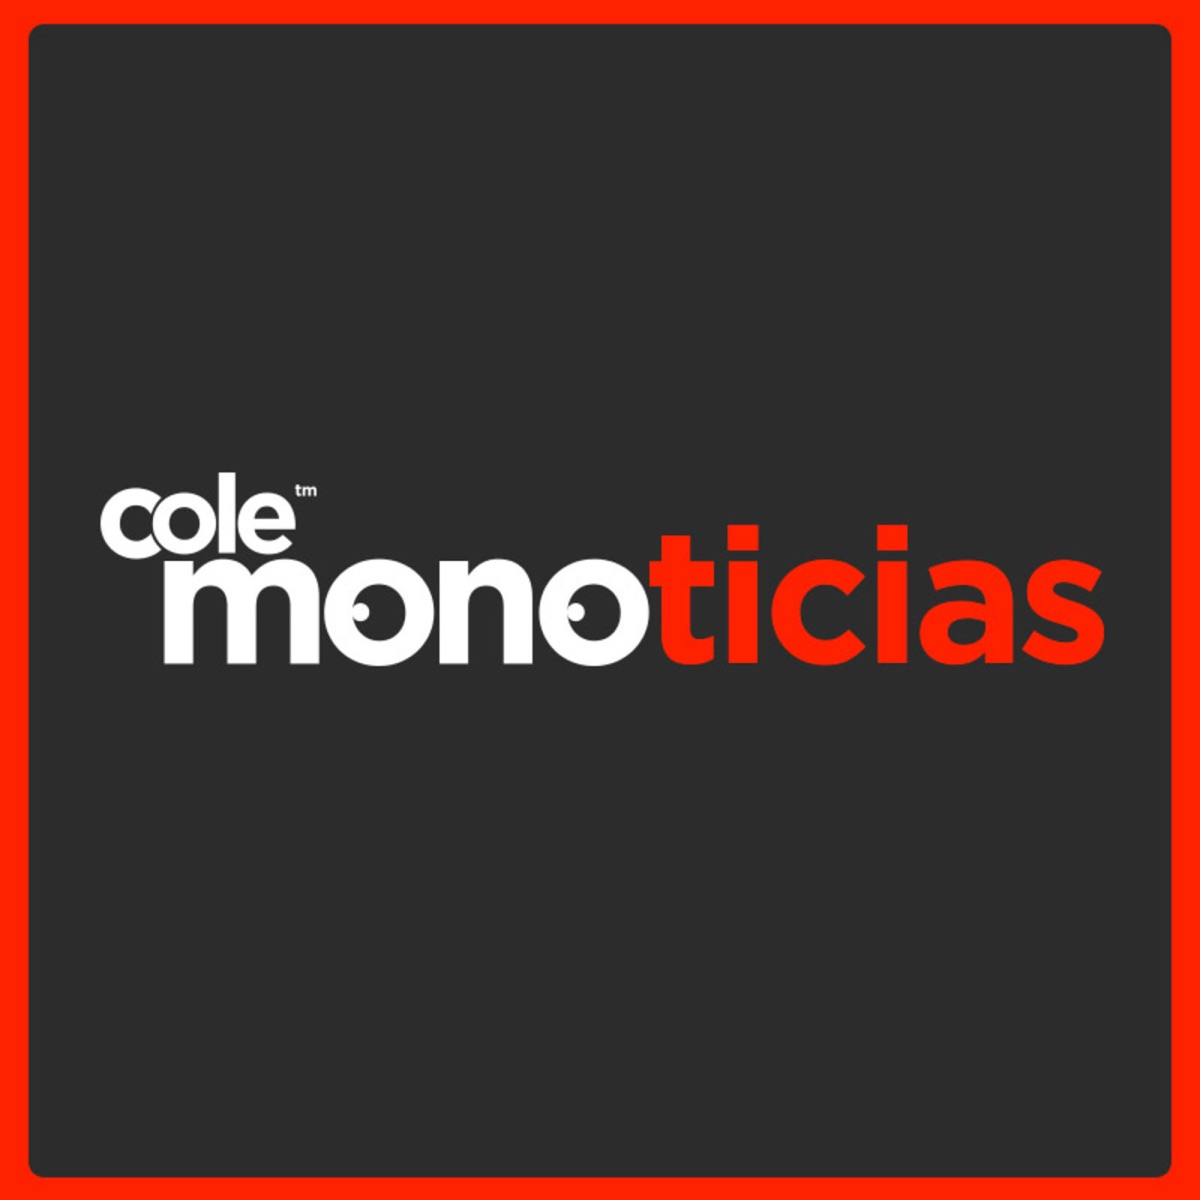 Monoticias